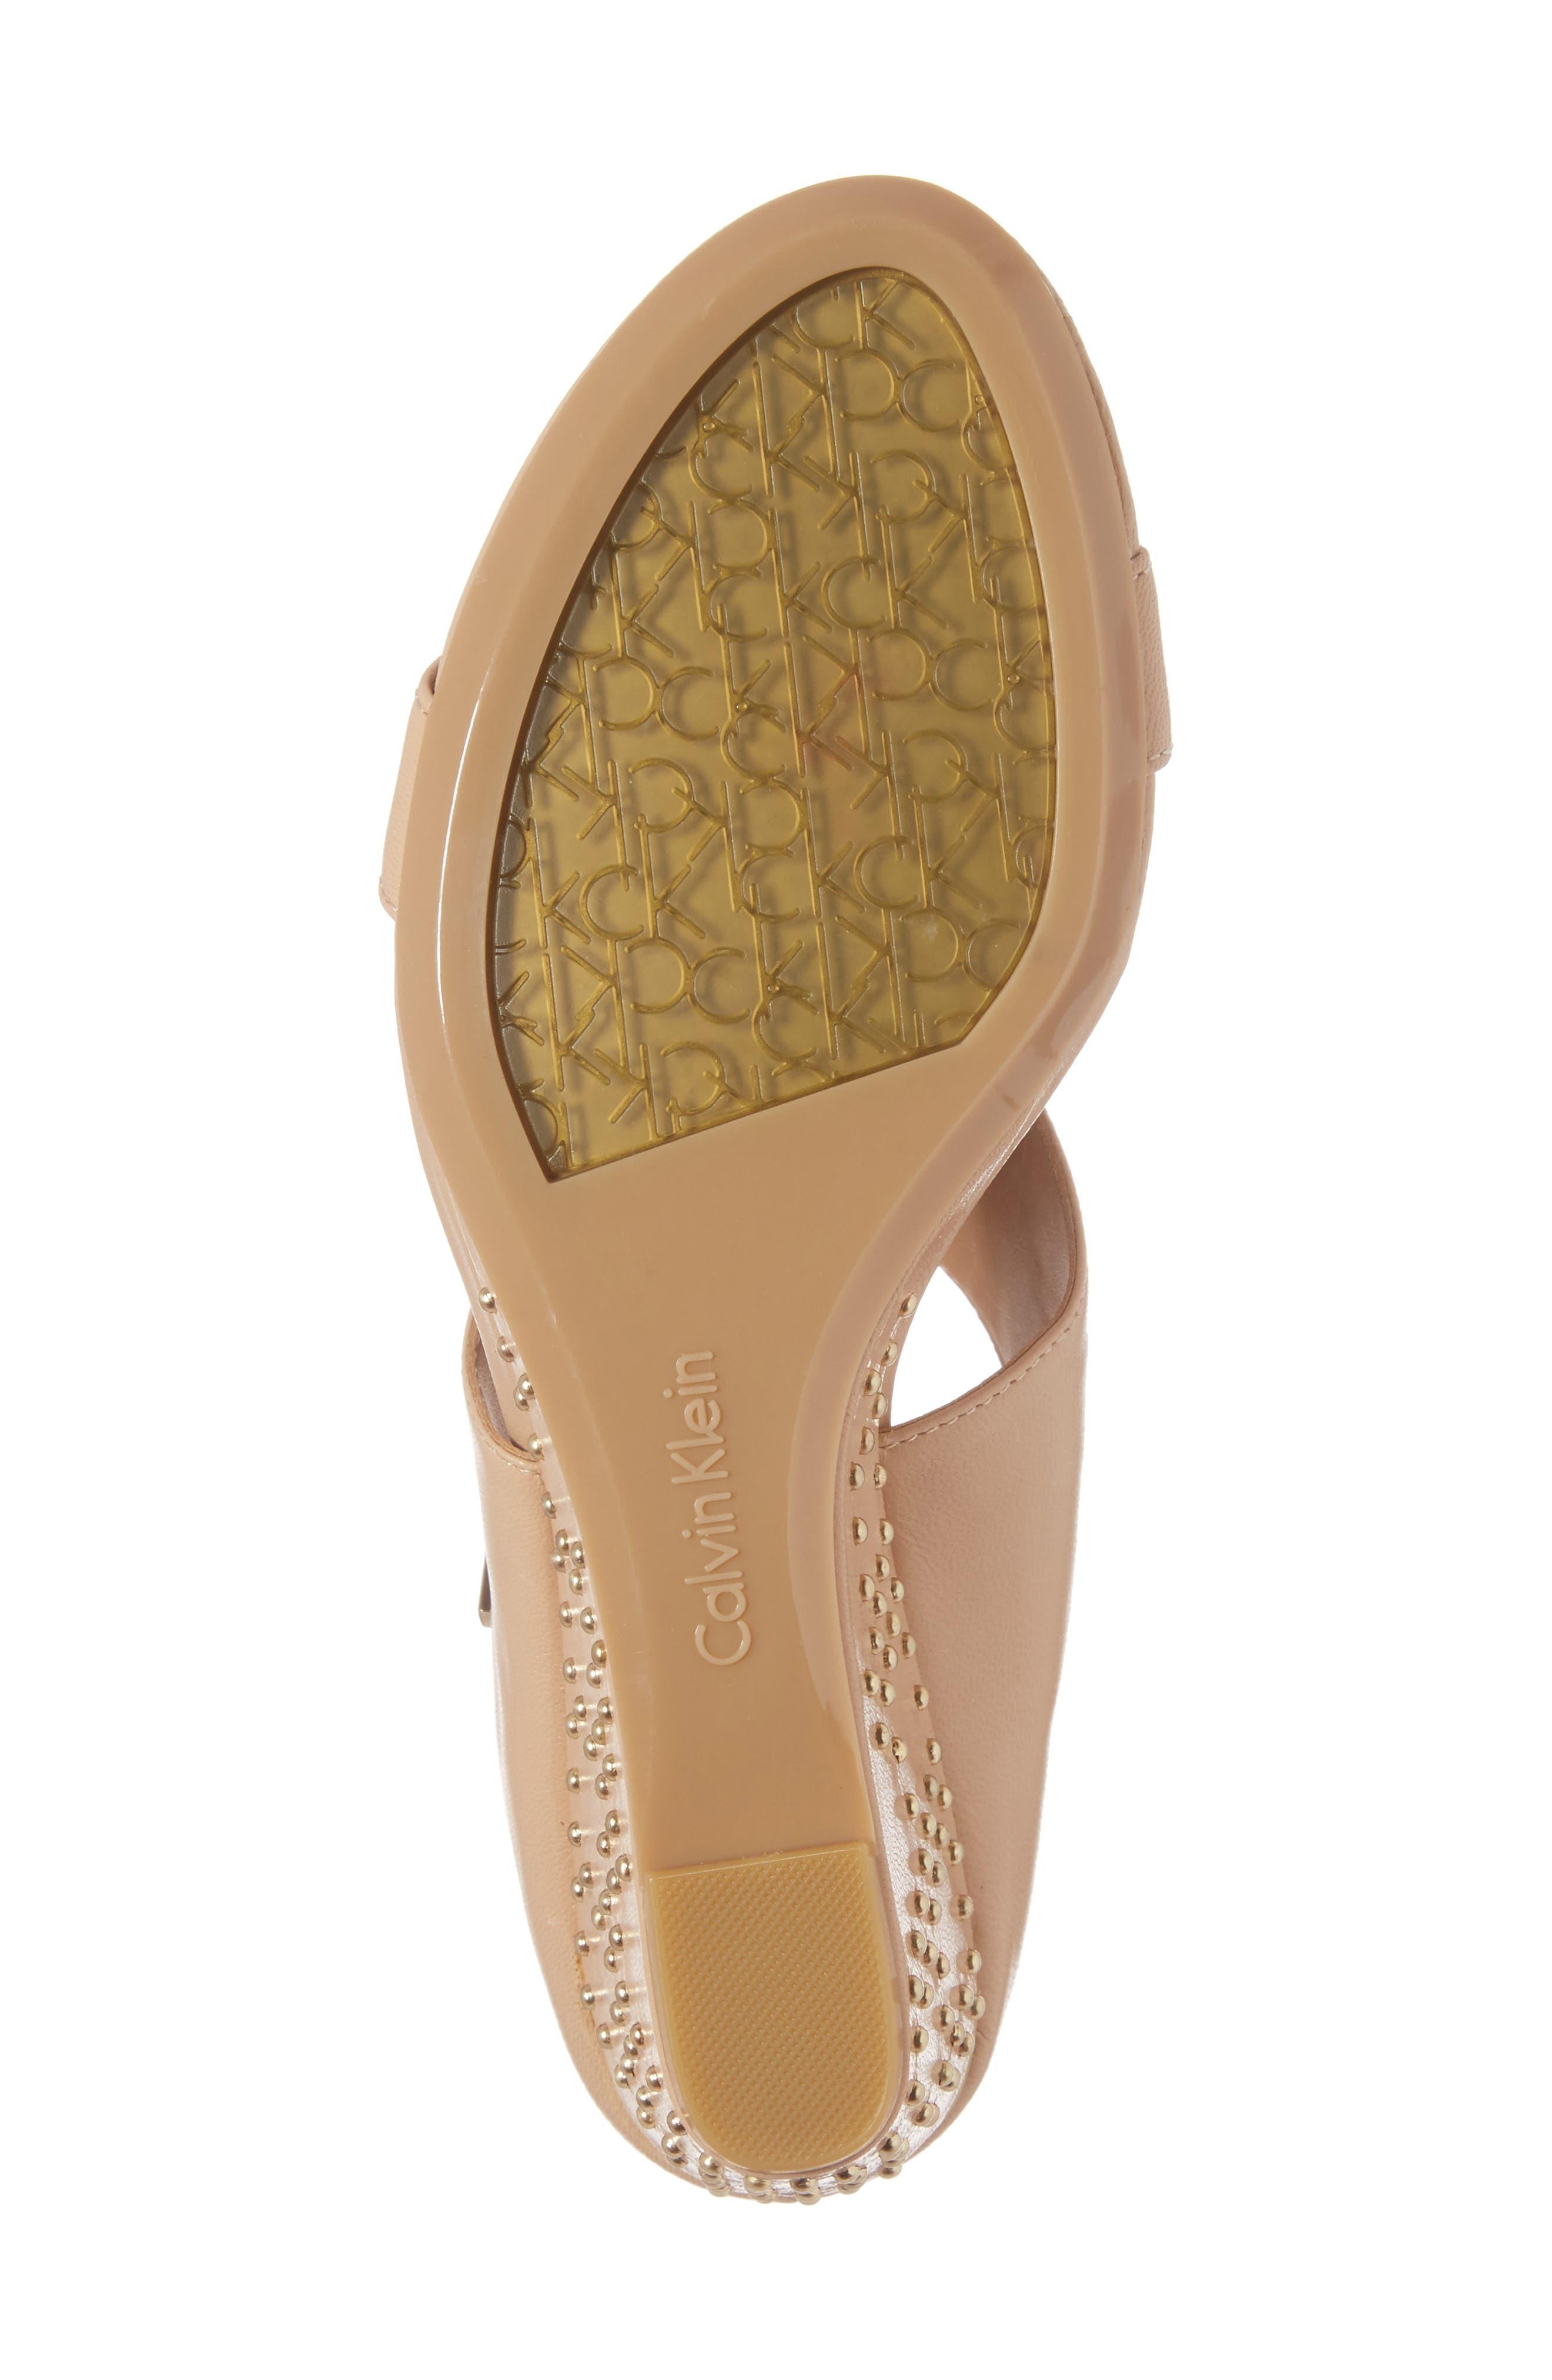 Phyllis Studded Wedge Sandal,                             Alternate thumbnail 24, color,